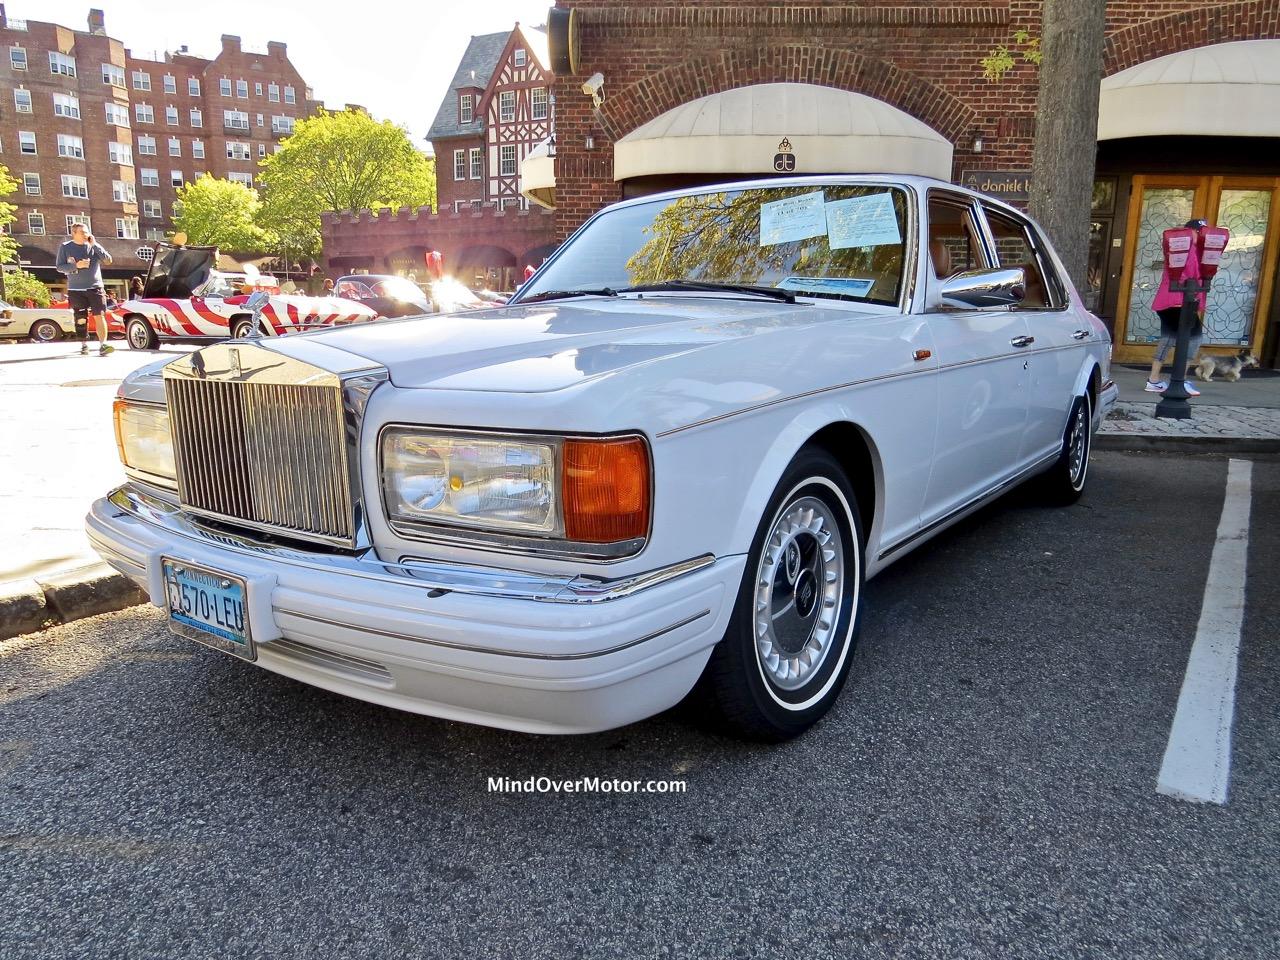 Rolls Royce Spur IV Front